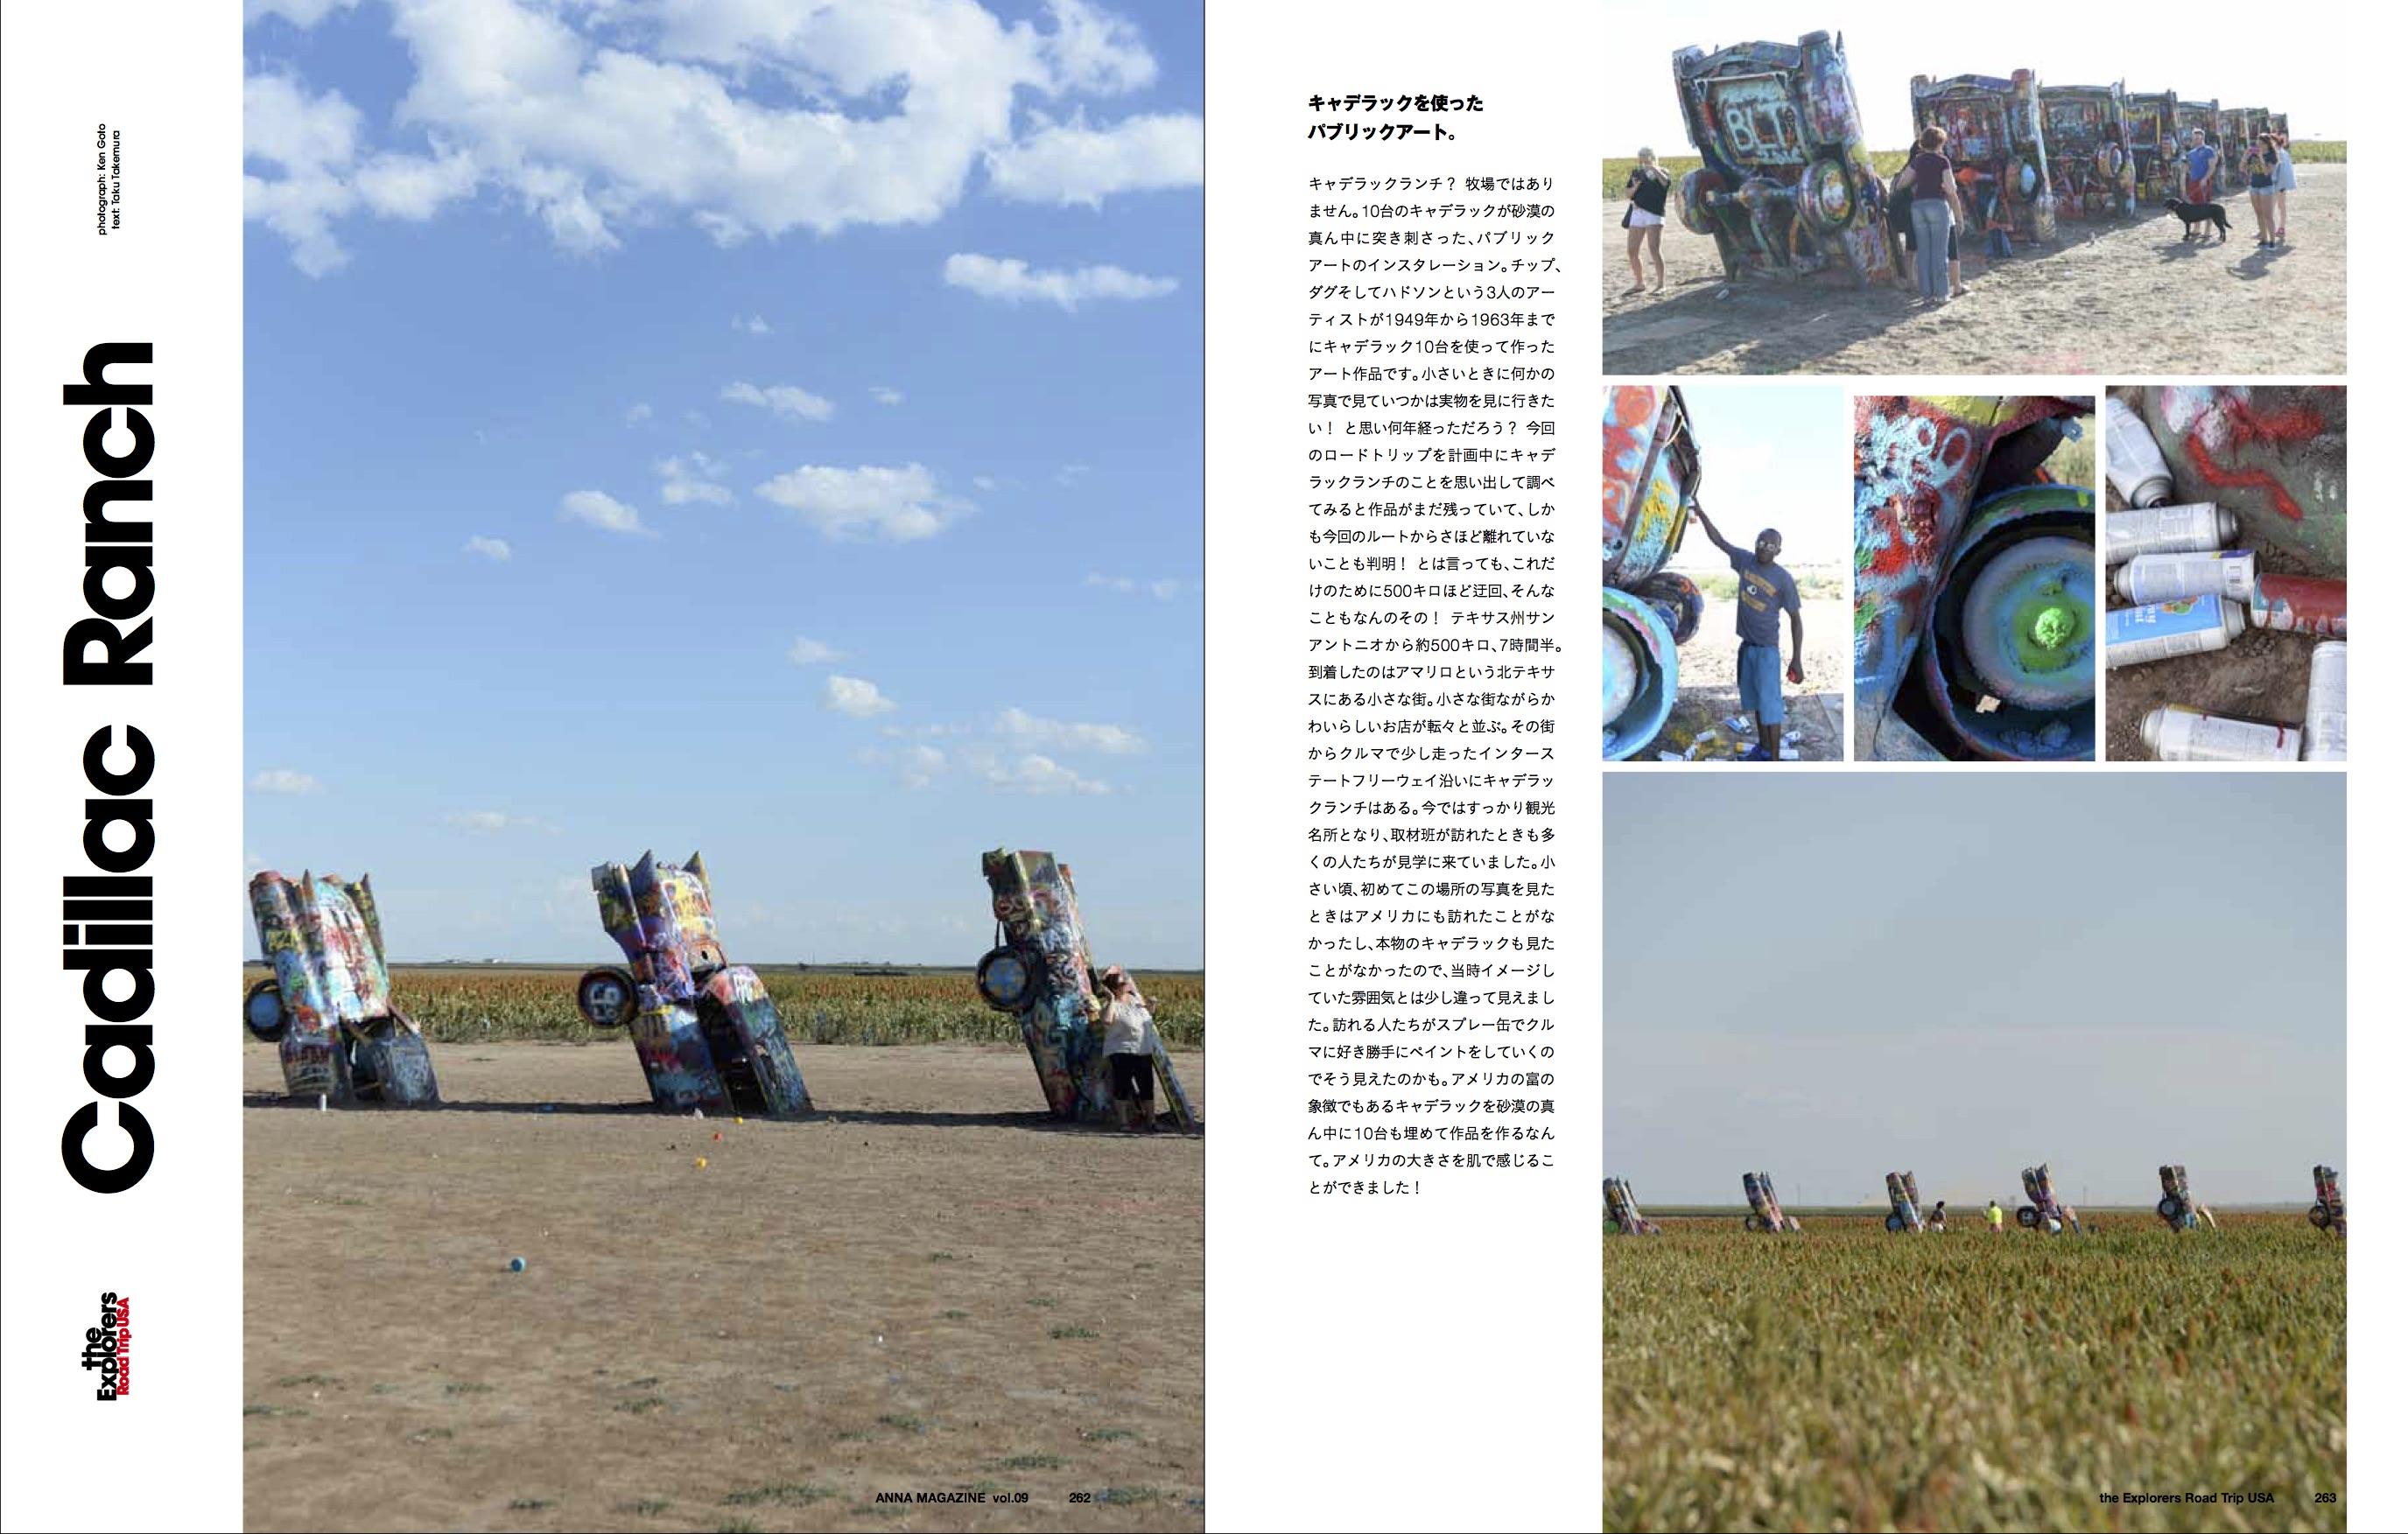 anna magazine vol.9 P124